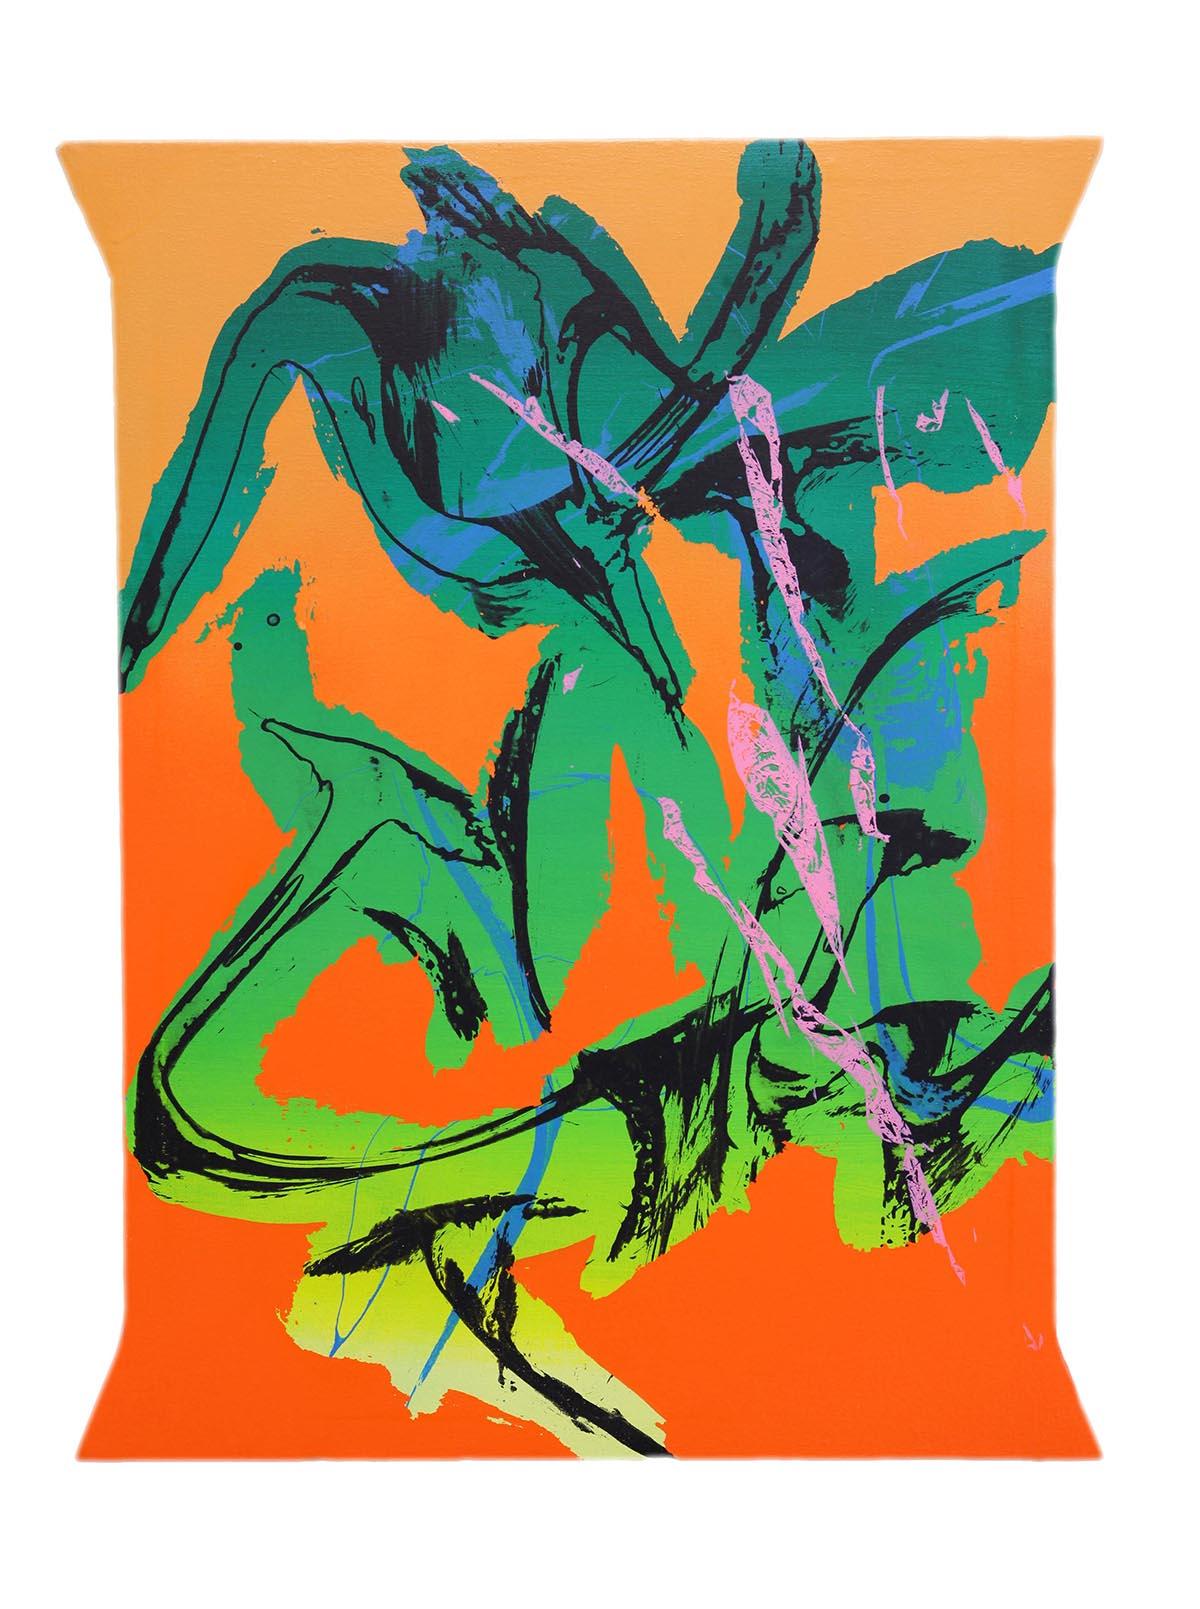 050719,2019,mixed technique on canvas, 45x59cm